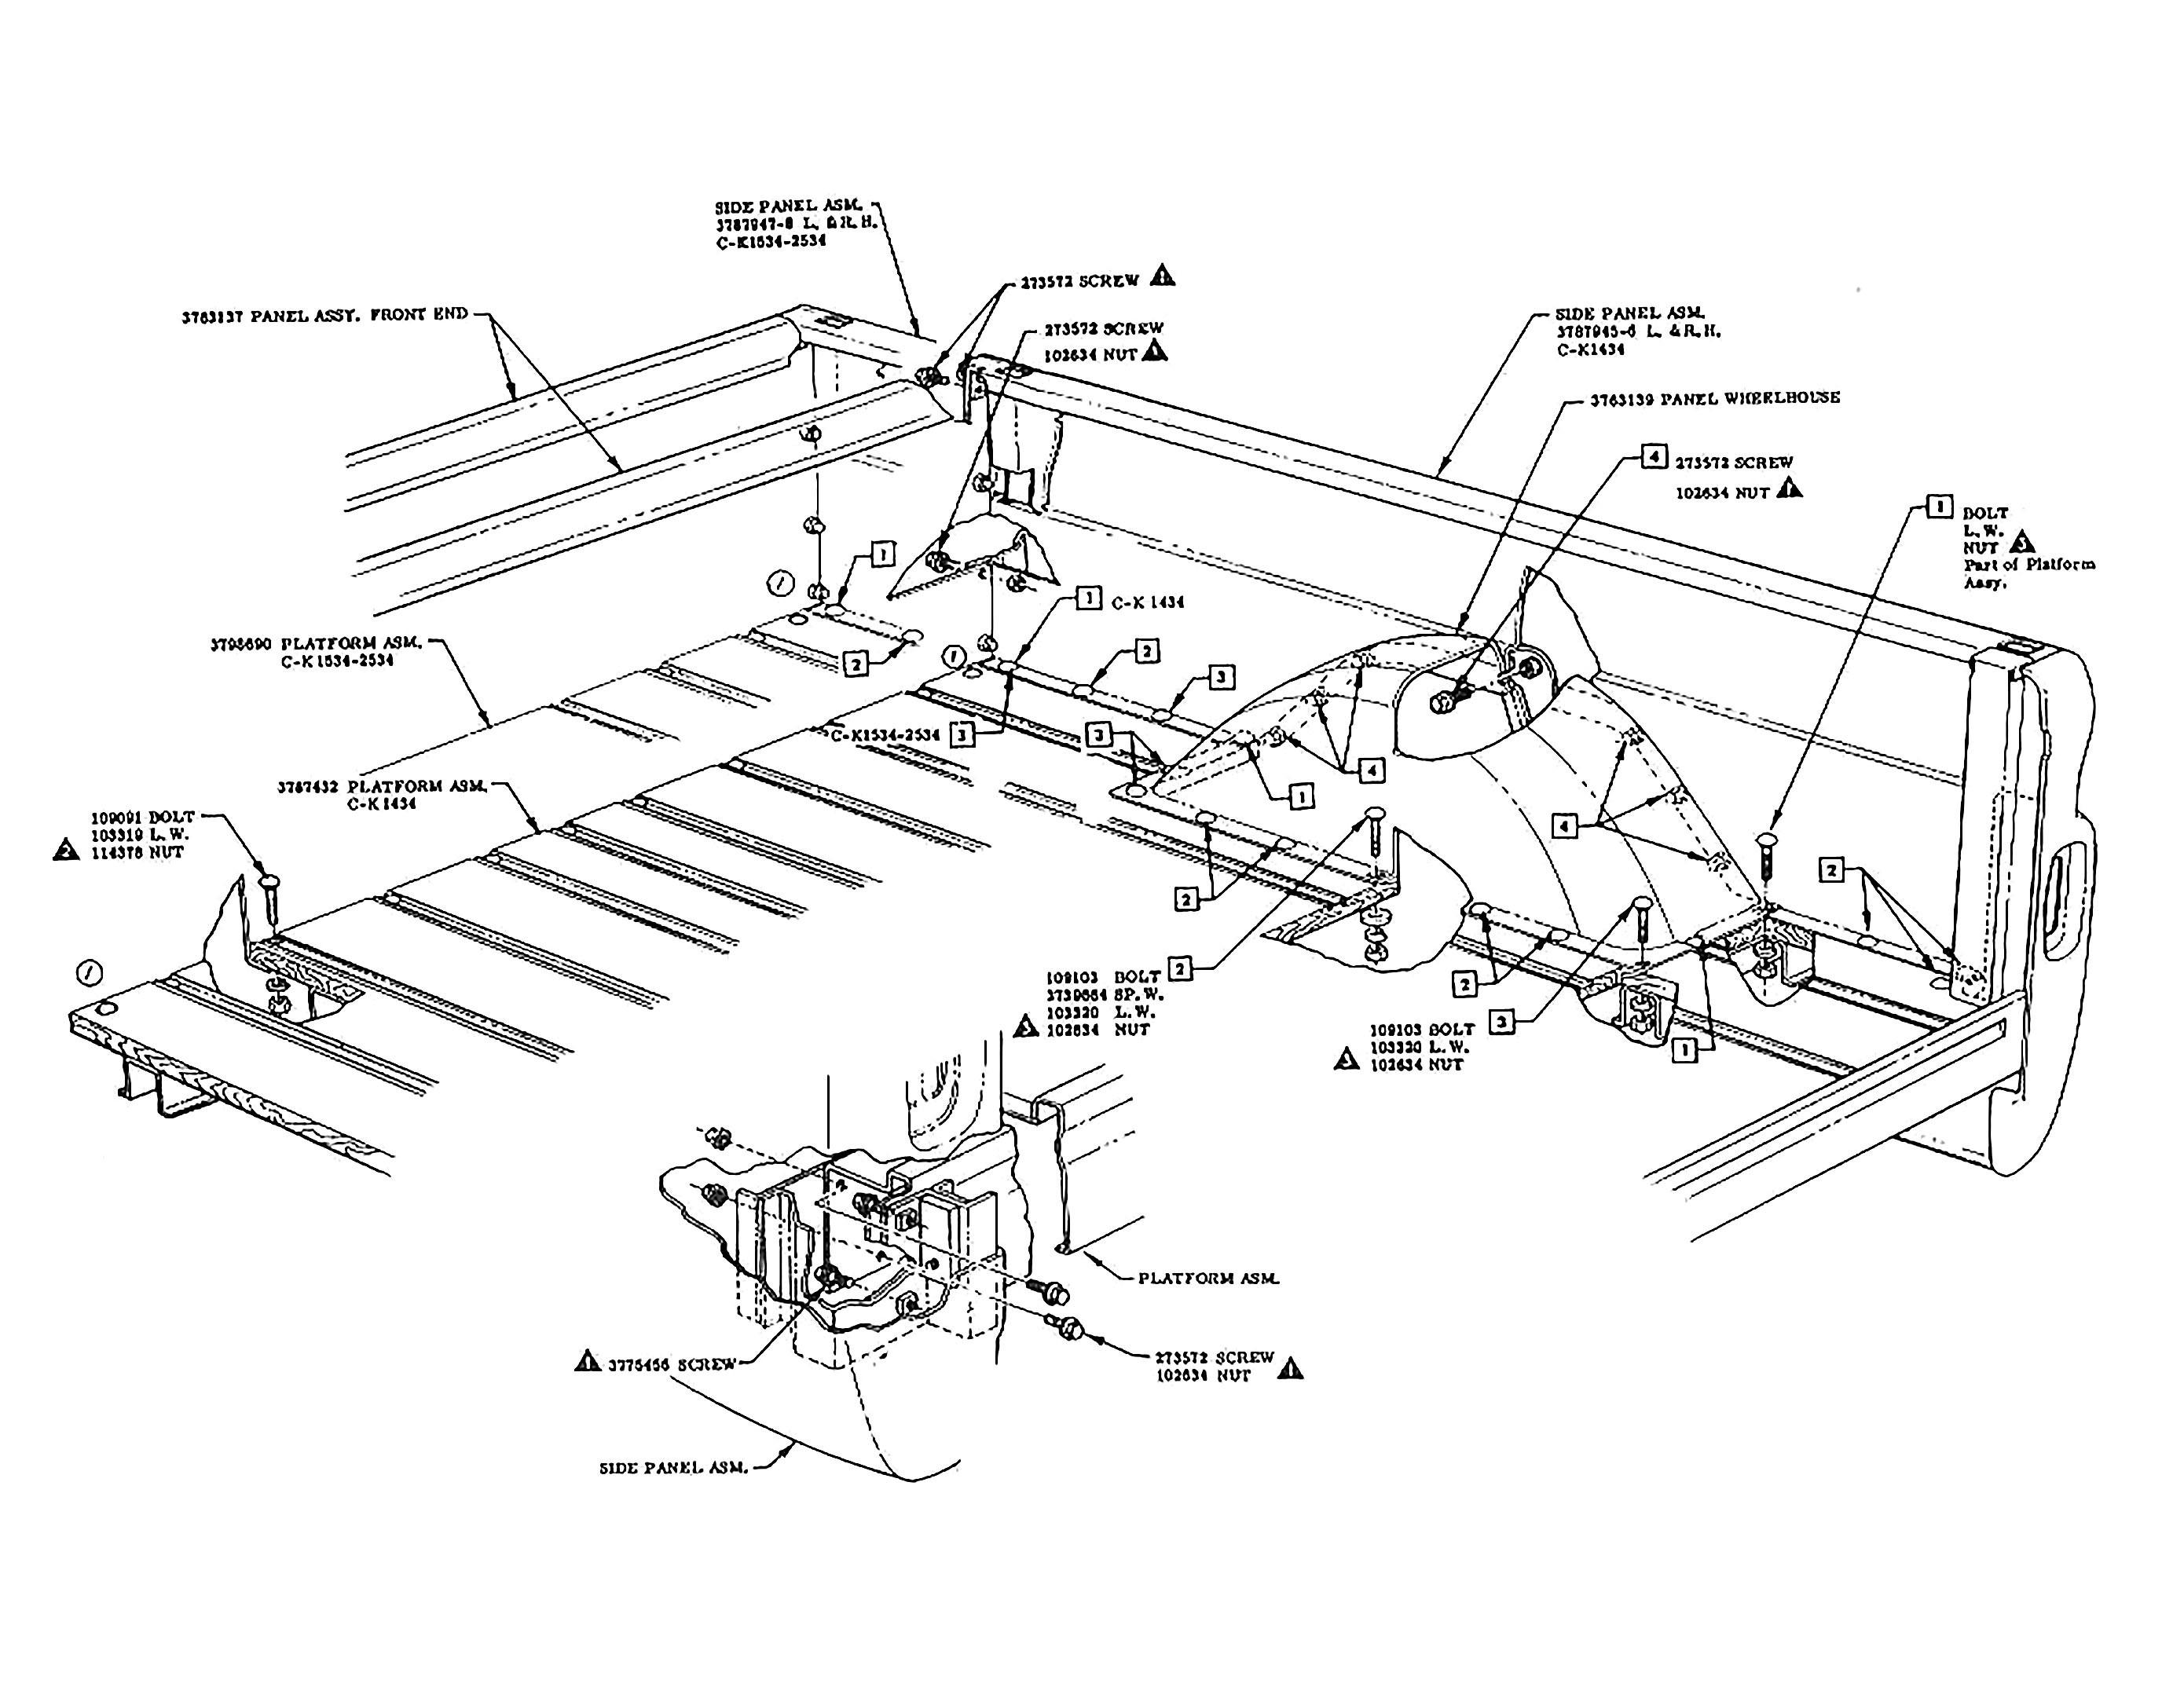 Steering Arm Diagram Bed Fleetside Diagram 60s Chevy C10 Body & Misc Of Steering Arm Diagram